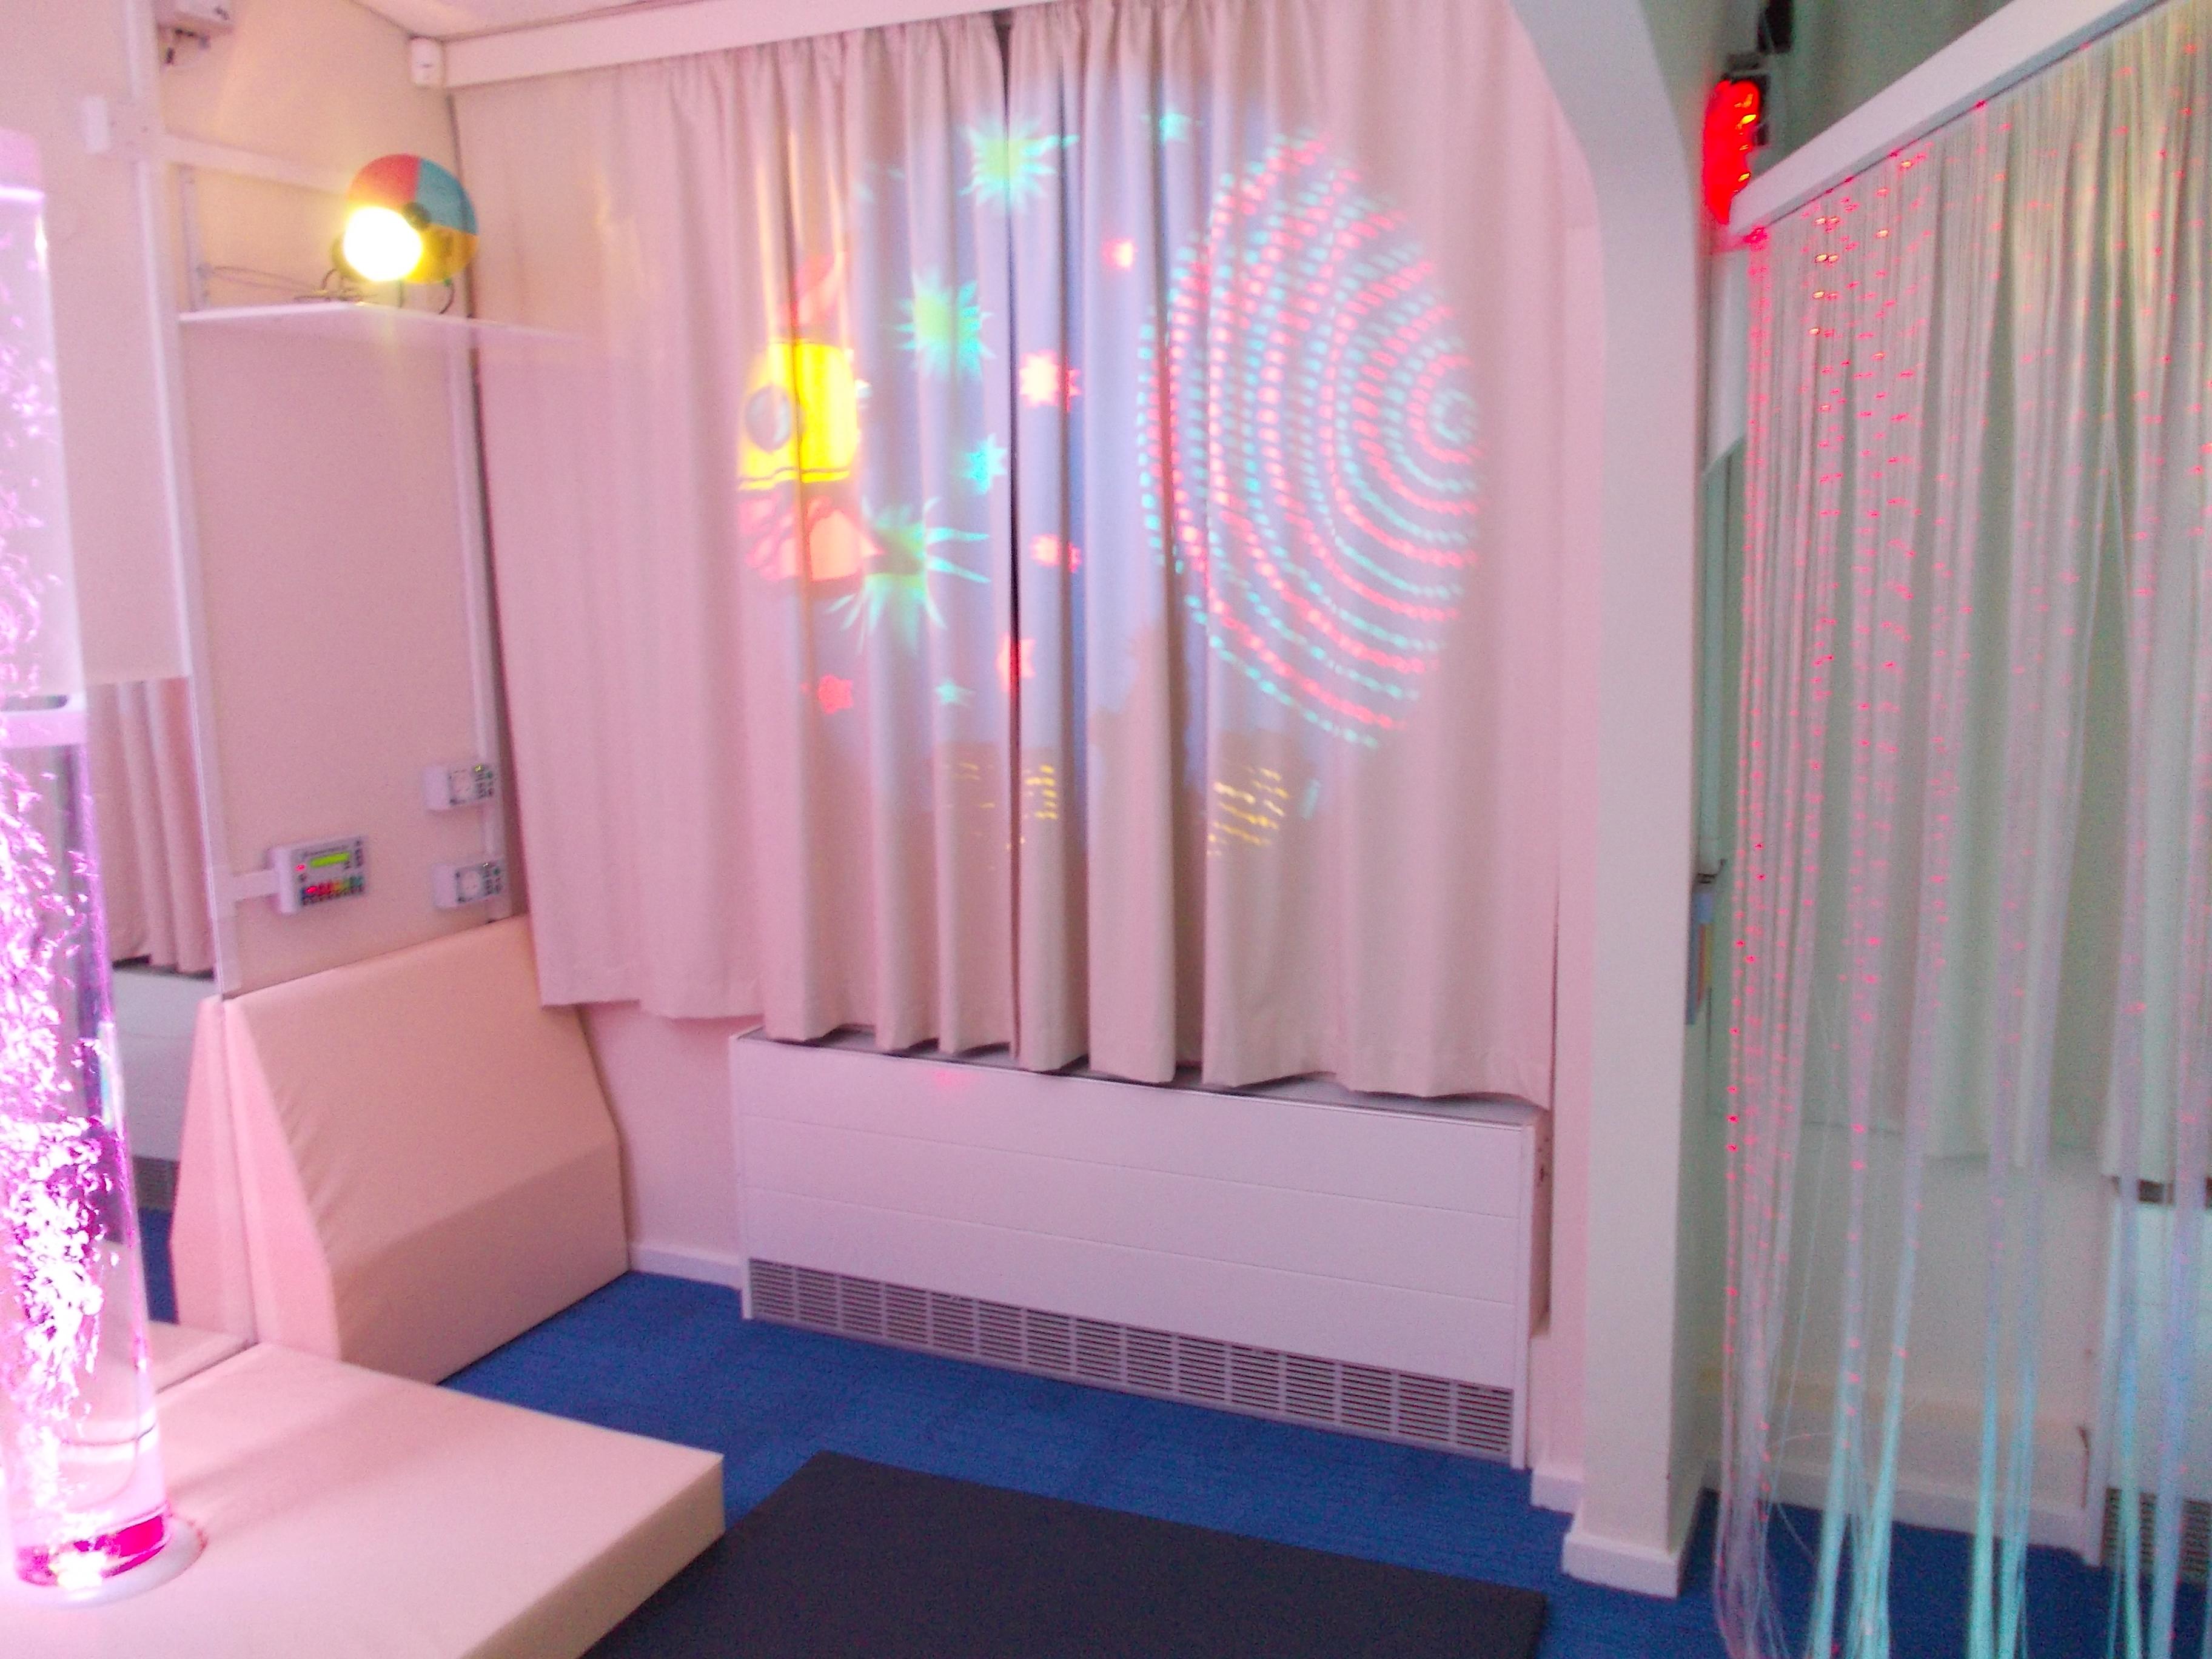 Main Sensory Room